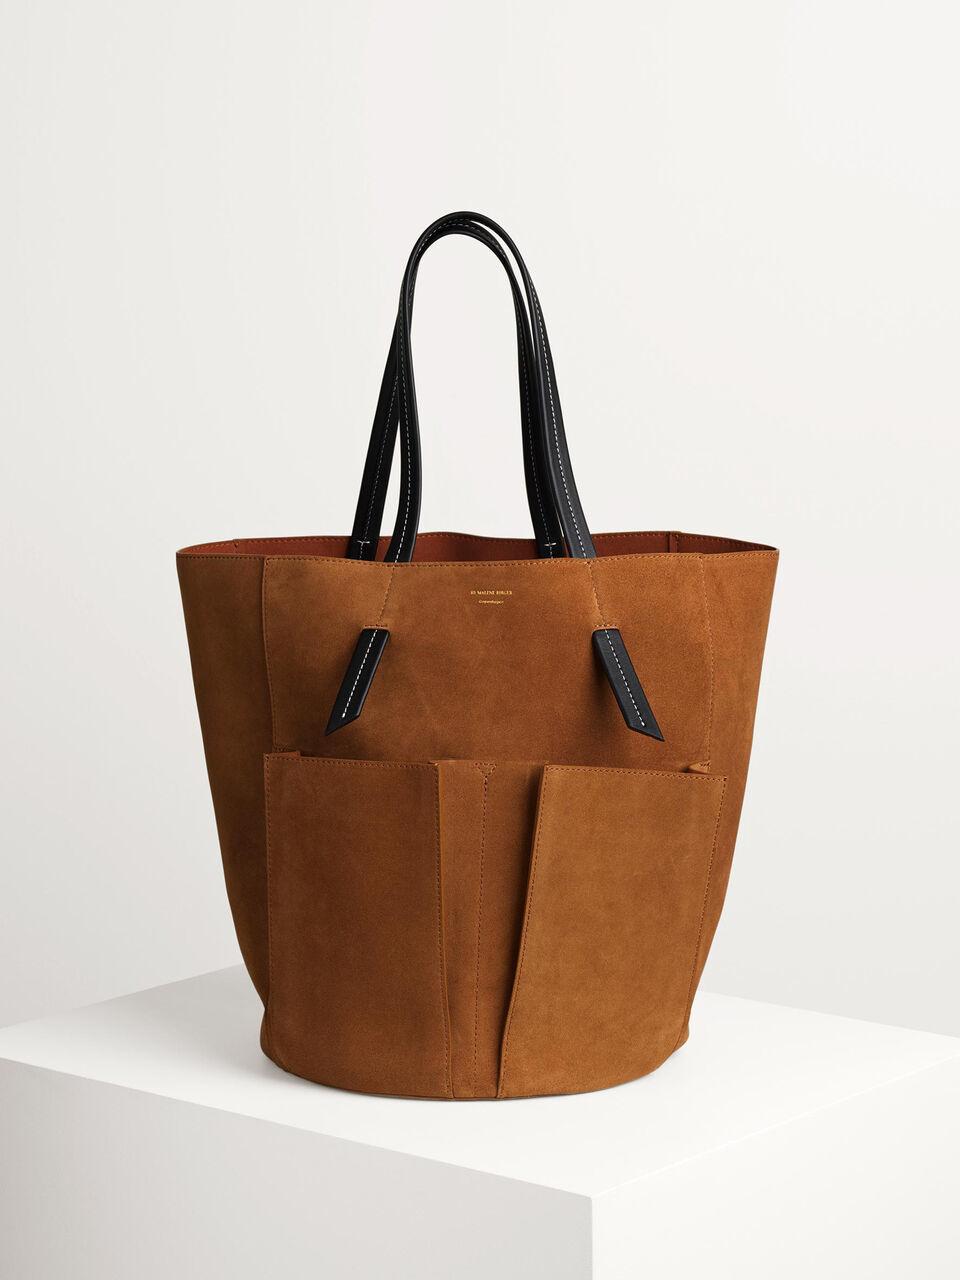 Tess tote bag by malene birger-3